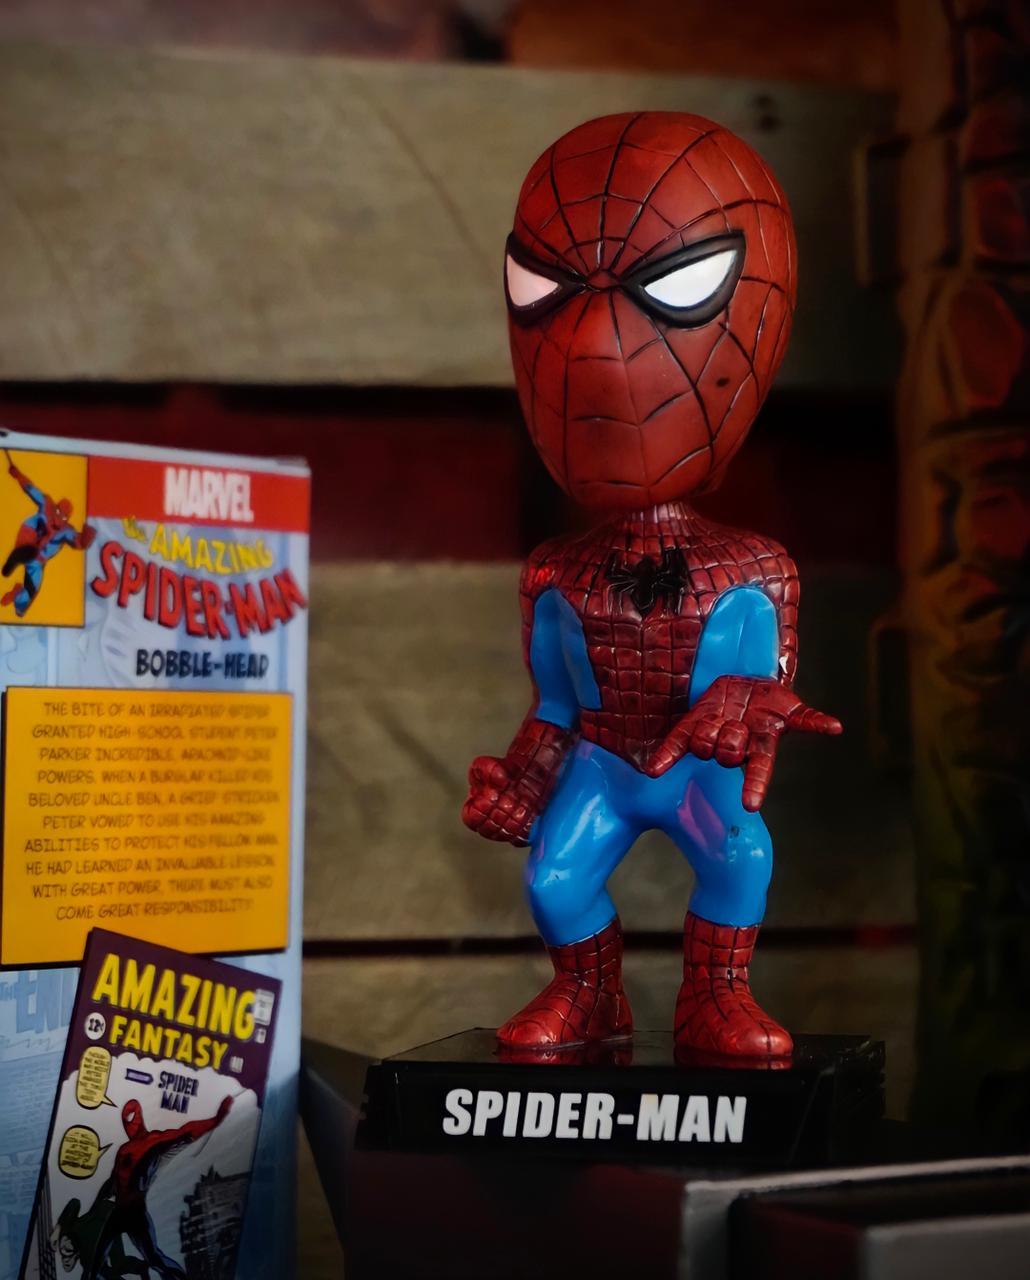 Estátua Wacky Wobbler Homem Aranha Spider-Man: Marvel Comics Bobble-Head - Funko